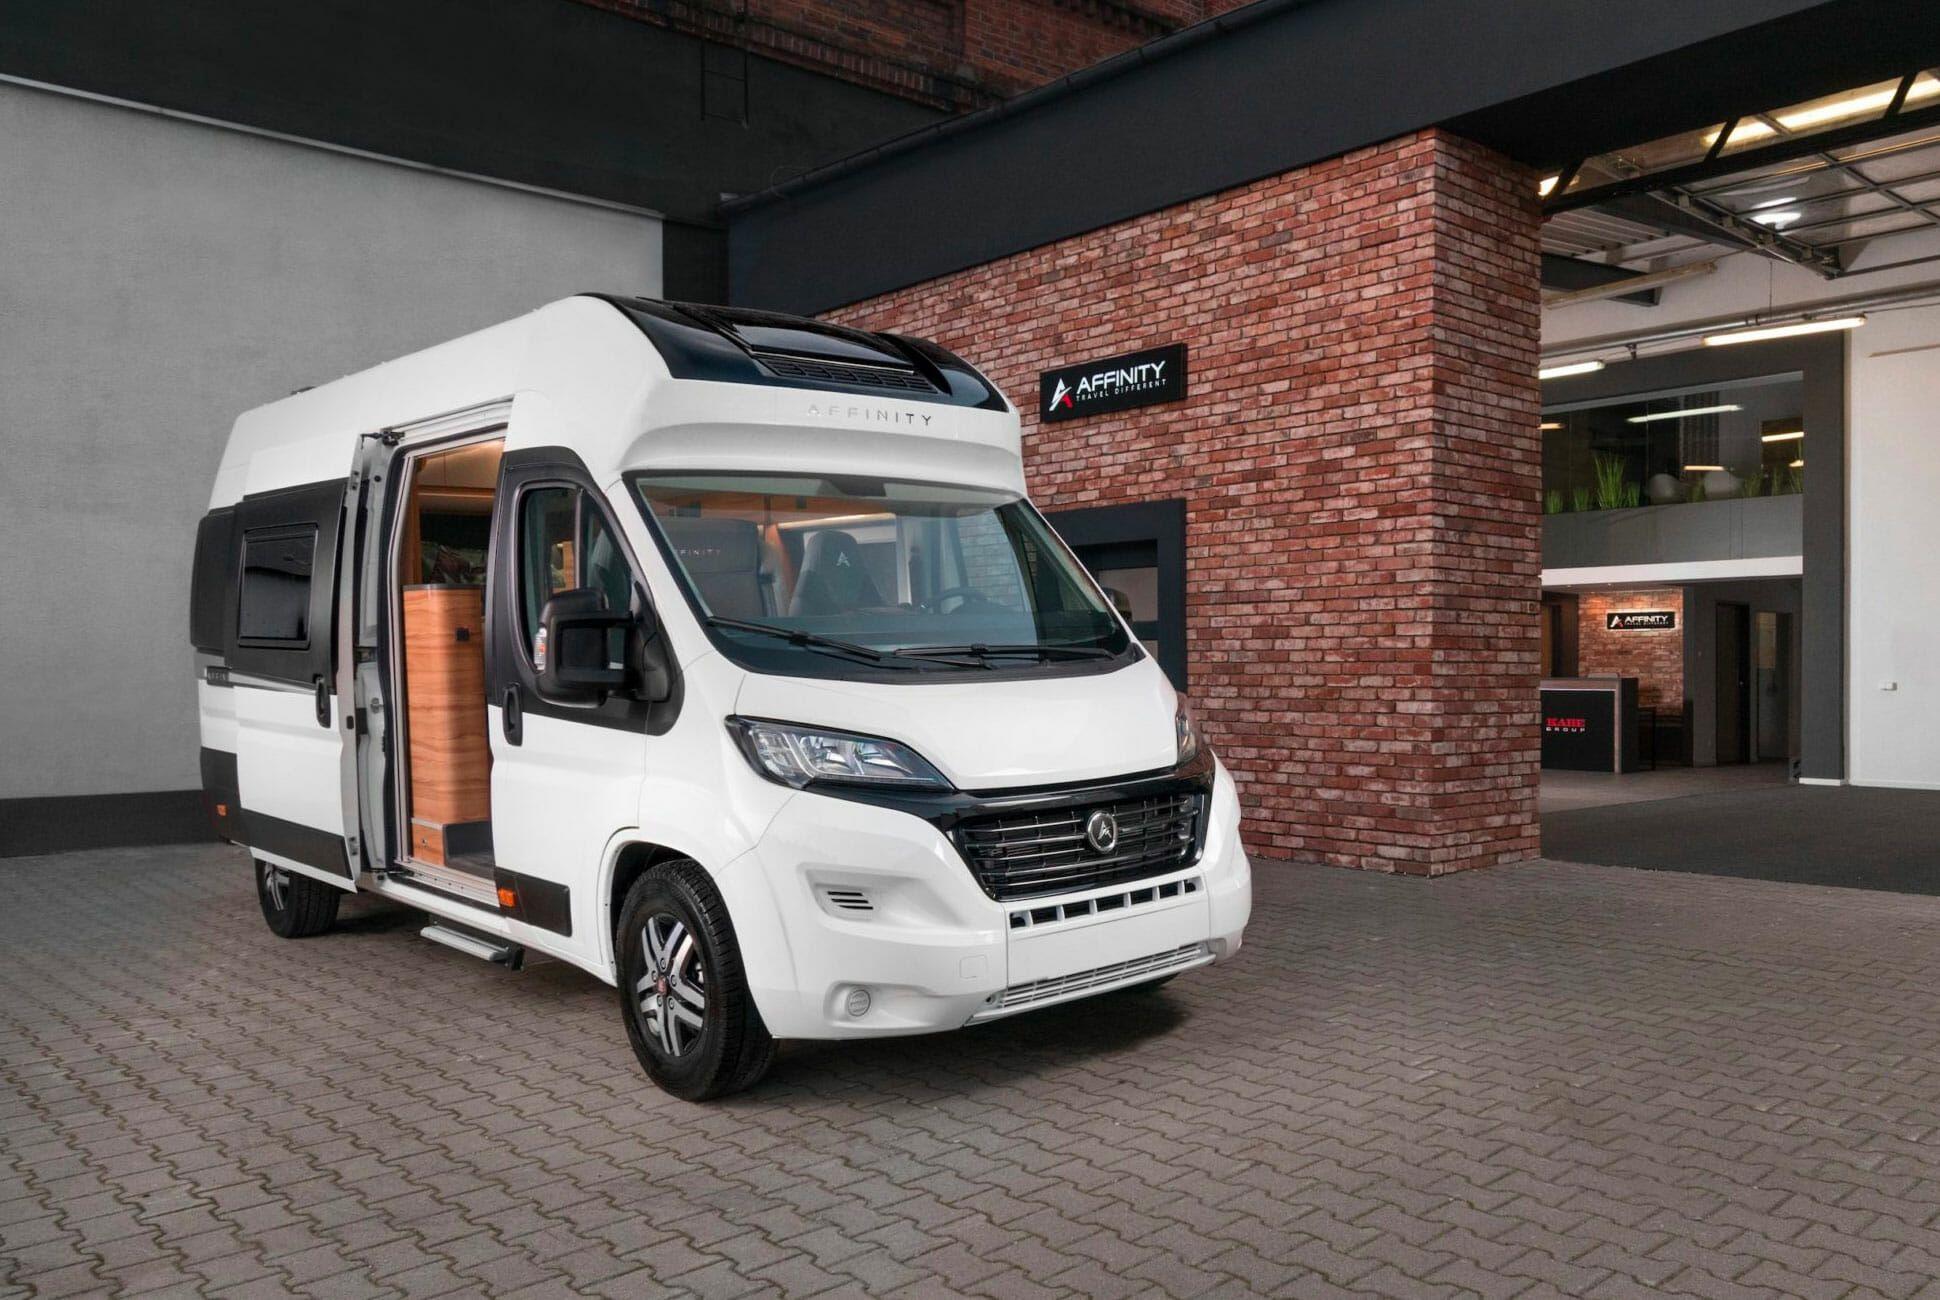 Camper Vans For Sale >> This Is One Of The Nicest Camper Vans We Ve Ever Seen Gear